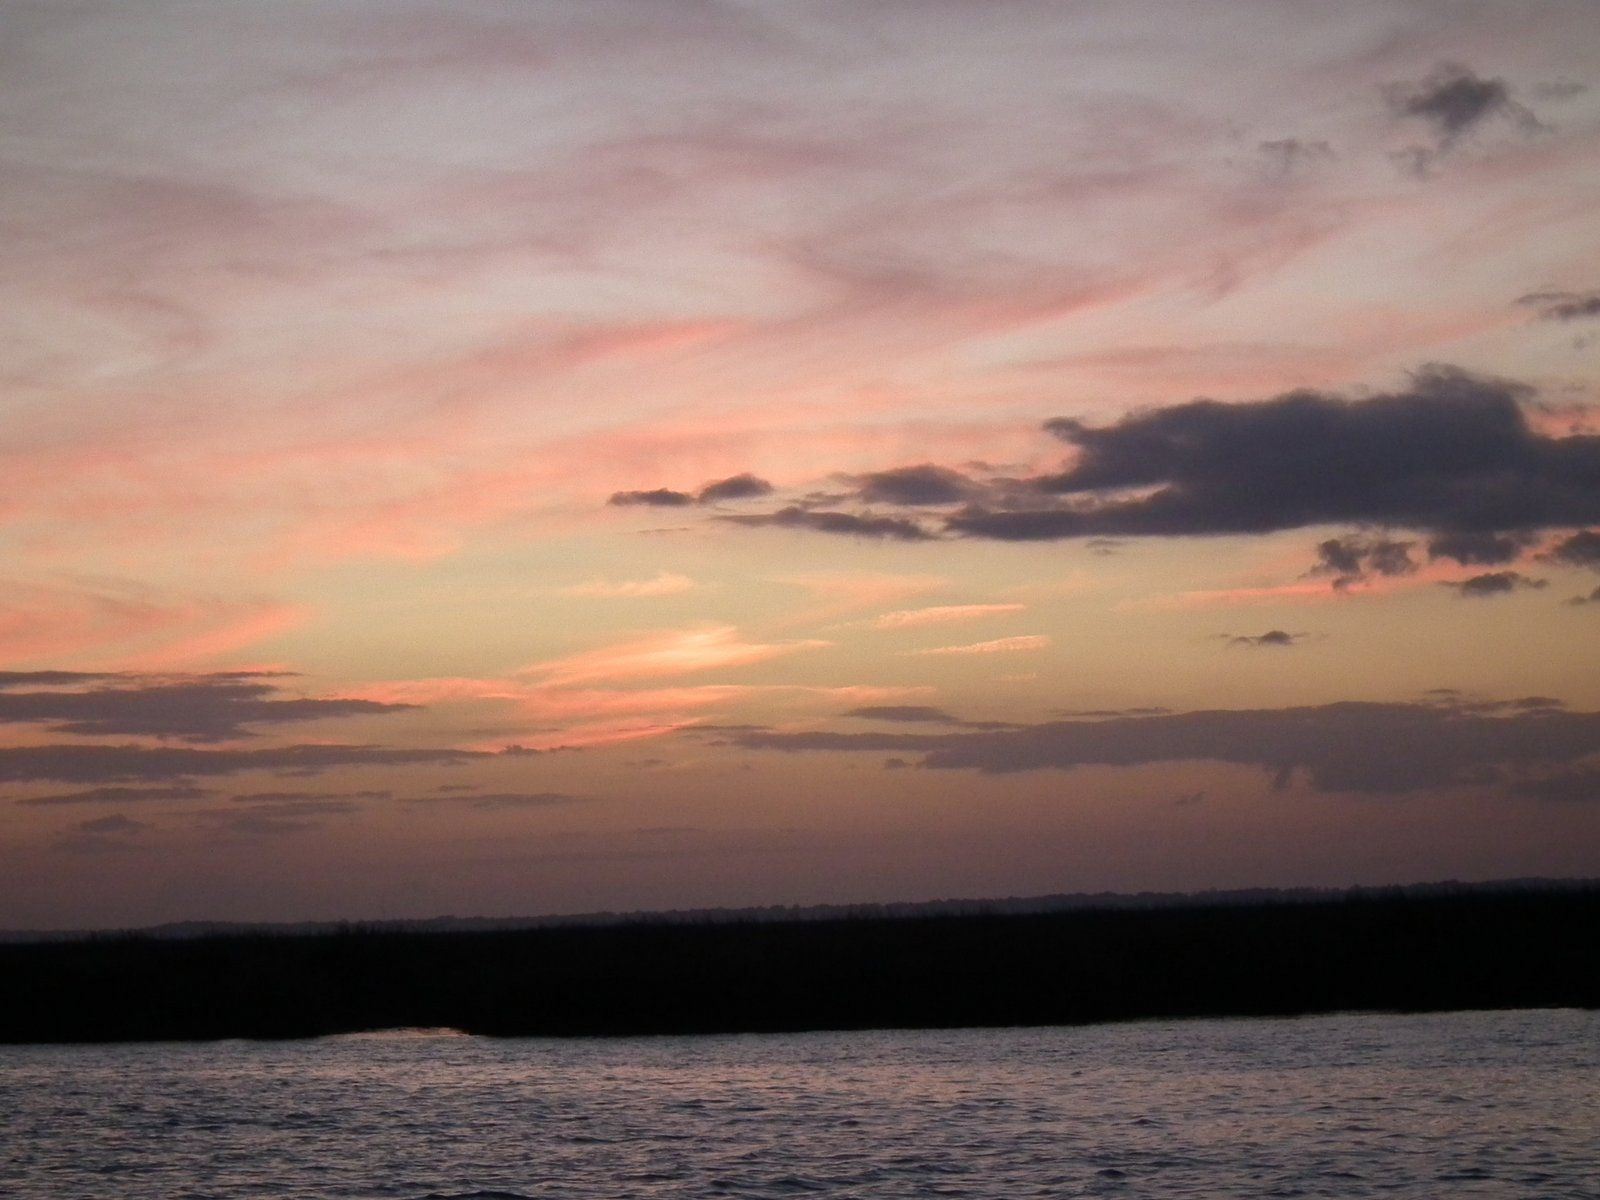 New Adventures - Traveling south - 2000+ miles - Dulpin River Georgia Sun set